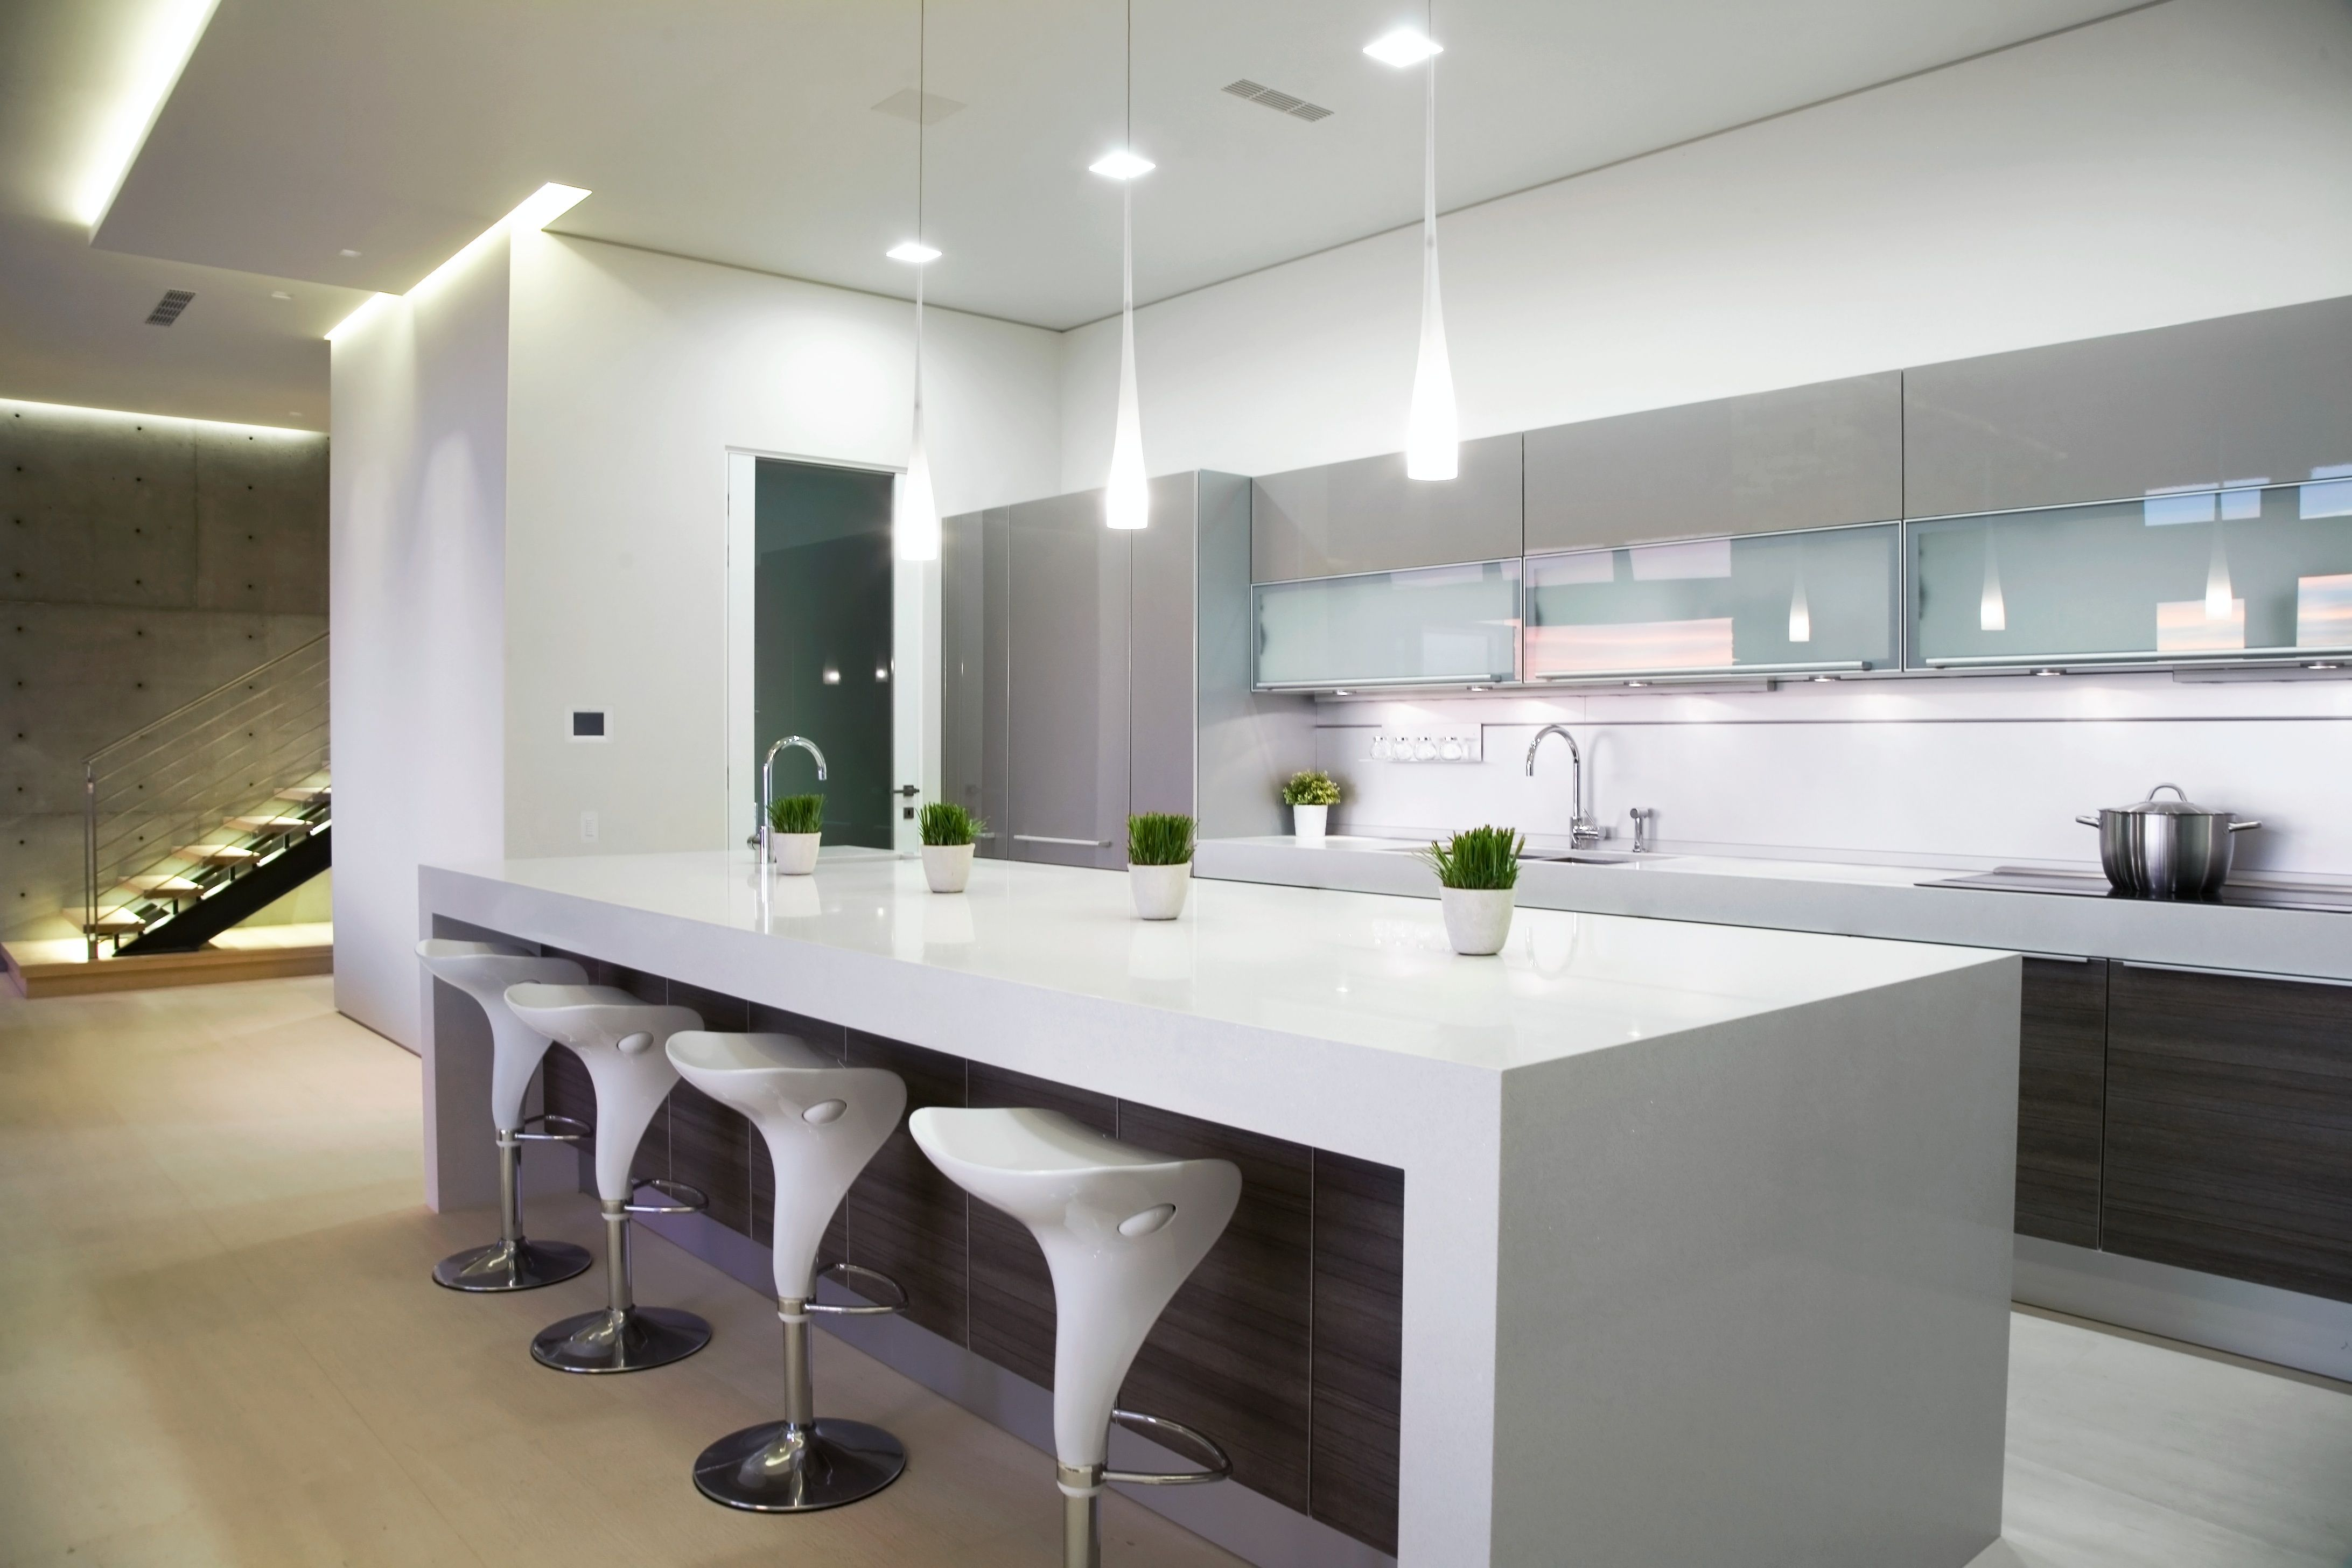 Blogtour Nyc Sponsor Poggenpohl Kitchens Contemporary Kitchen Design Modern Kitchen Design Modern Kitchen Lighting